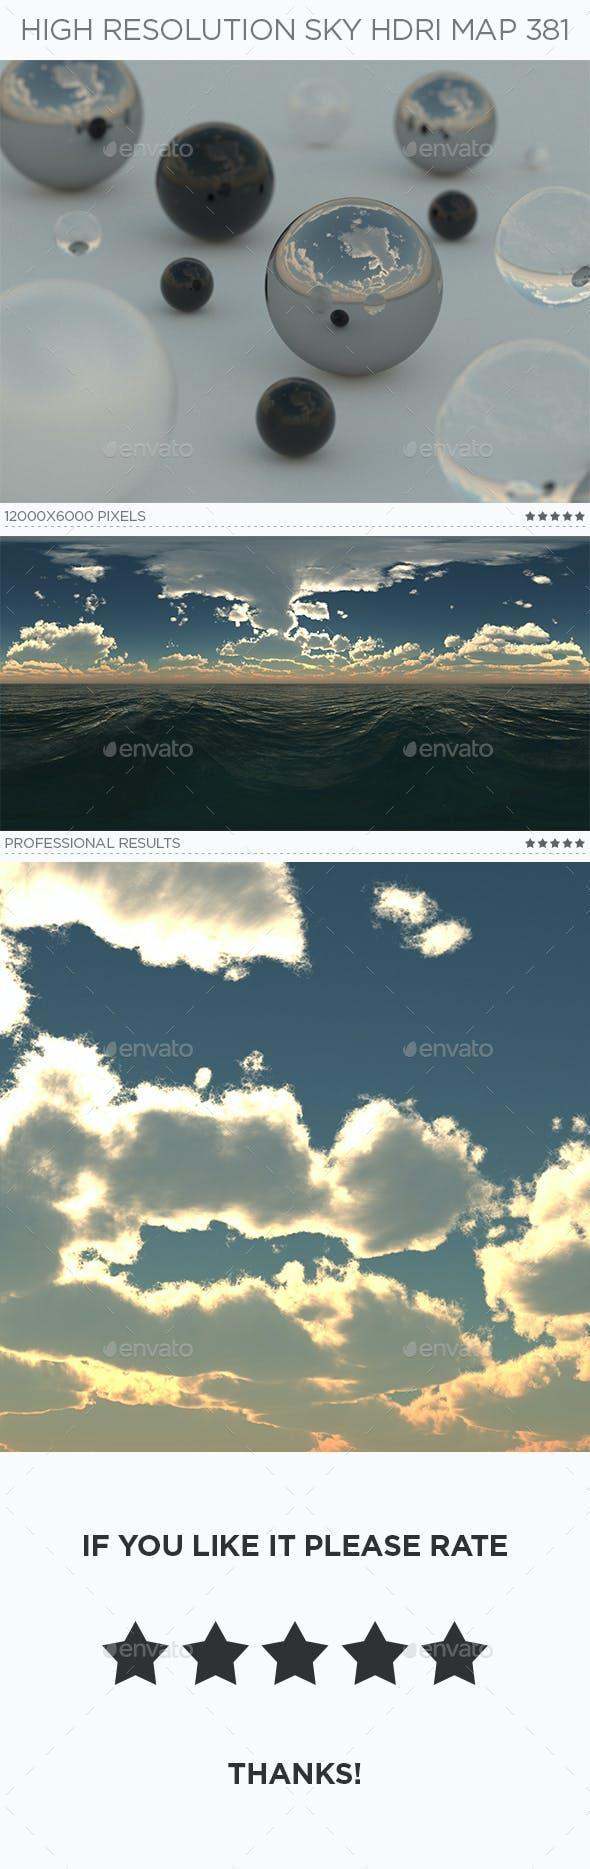 High Resolution Sky HDRi Map 381 - 3DOcean Item for Sale